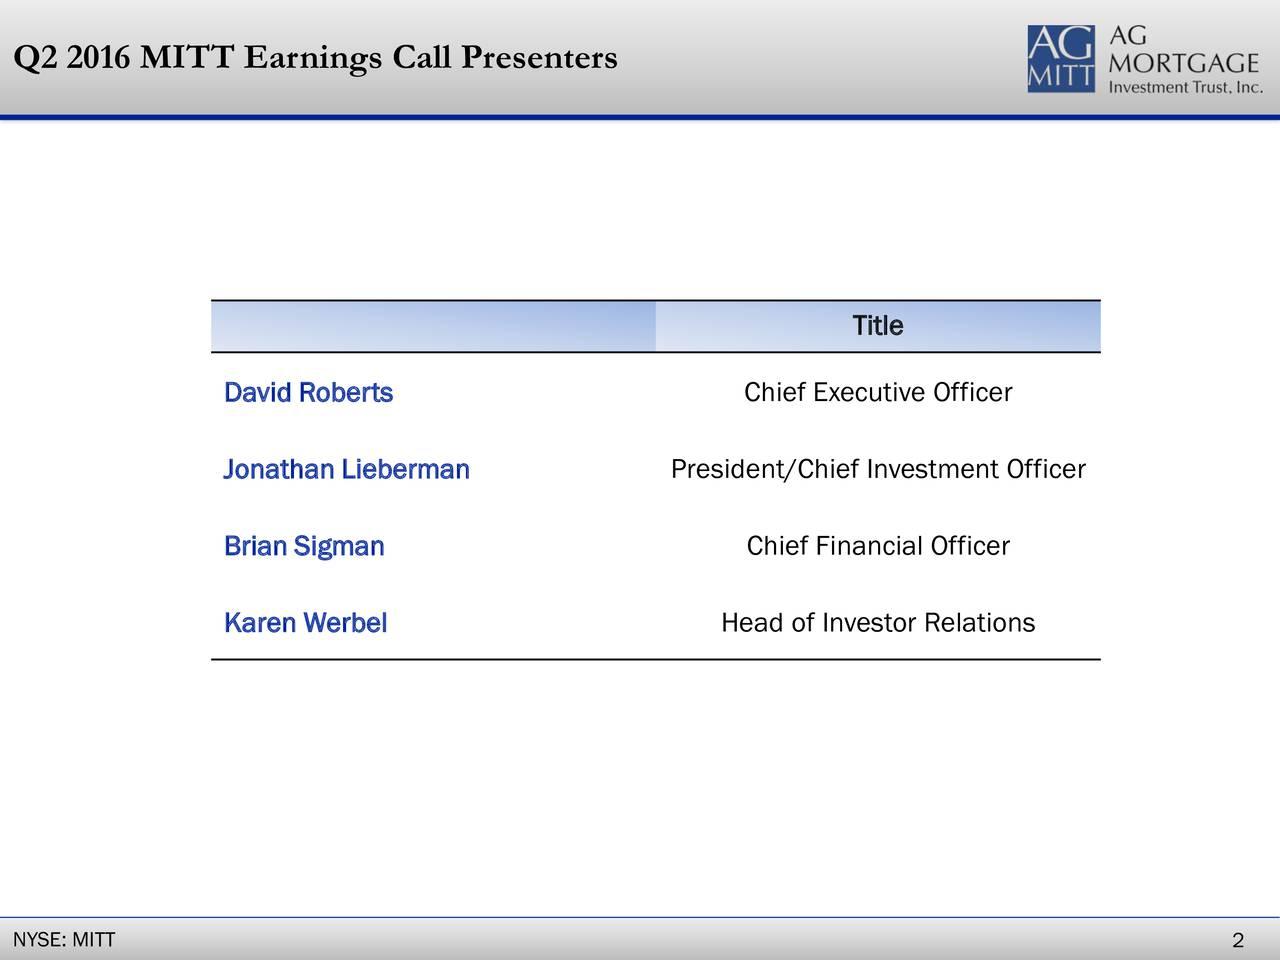 Title DavidRoberts Chief Executive Officer Jonathan Lieberman President/Chief Investment Officer Brian Sigman Chief Financial Officer Karen Werbel Head of Investor Relations NYSE: MITT